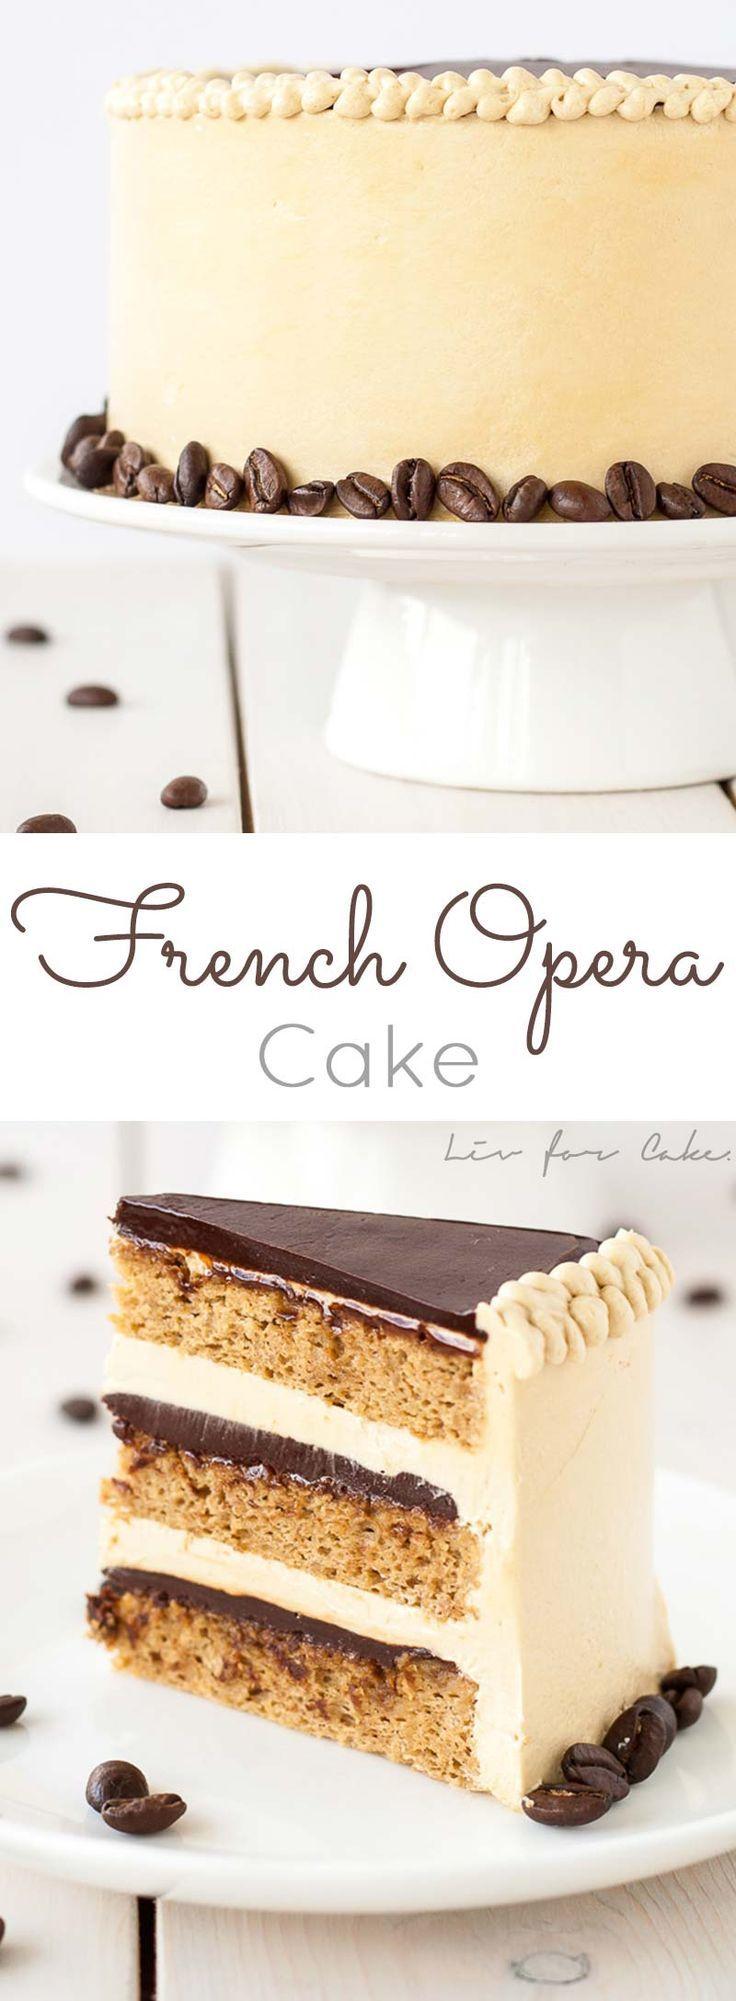 French Opera Cake + Layered Cookbook Giveaway